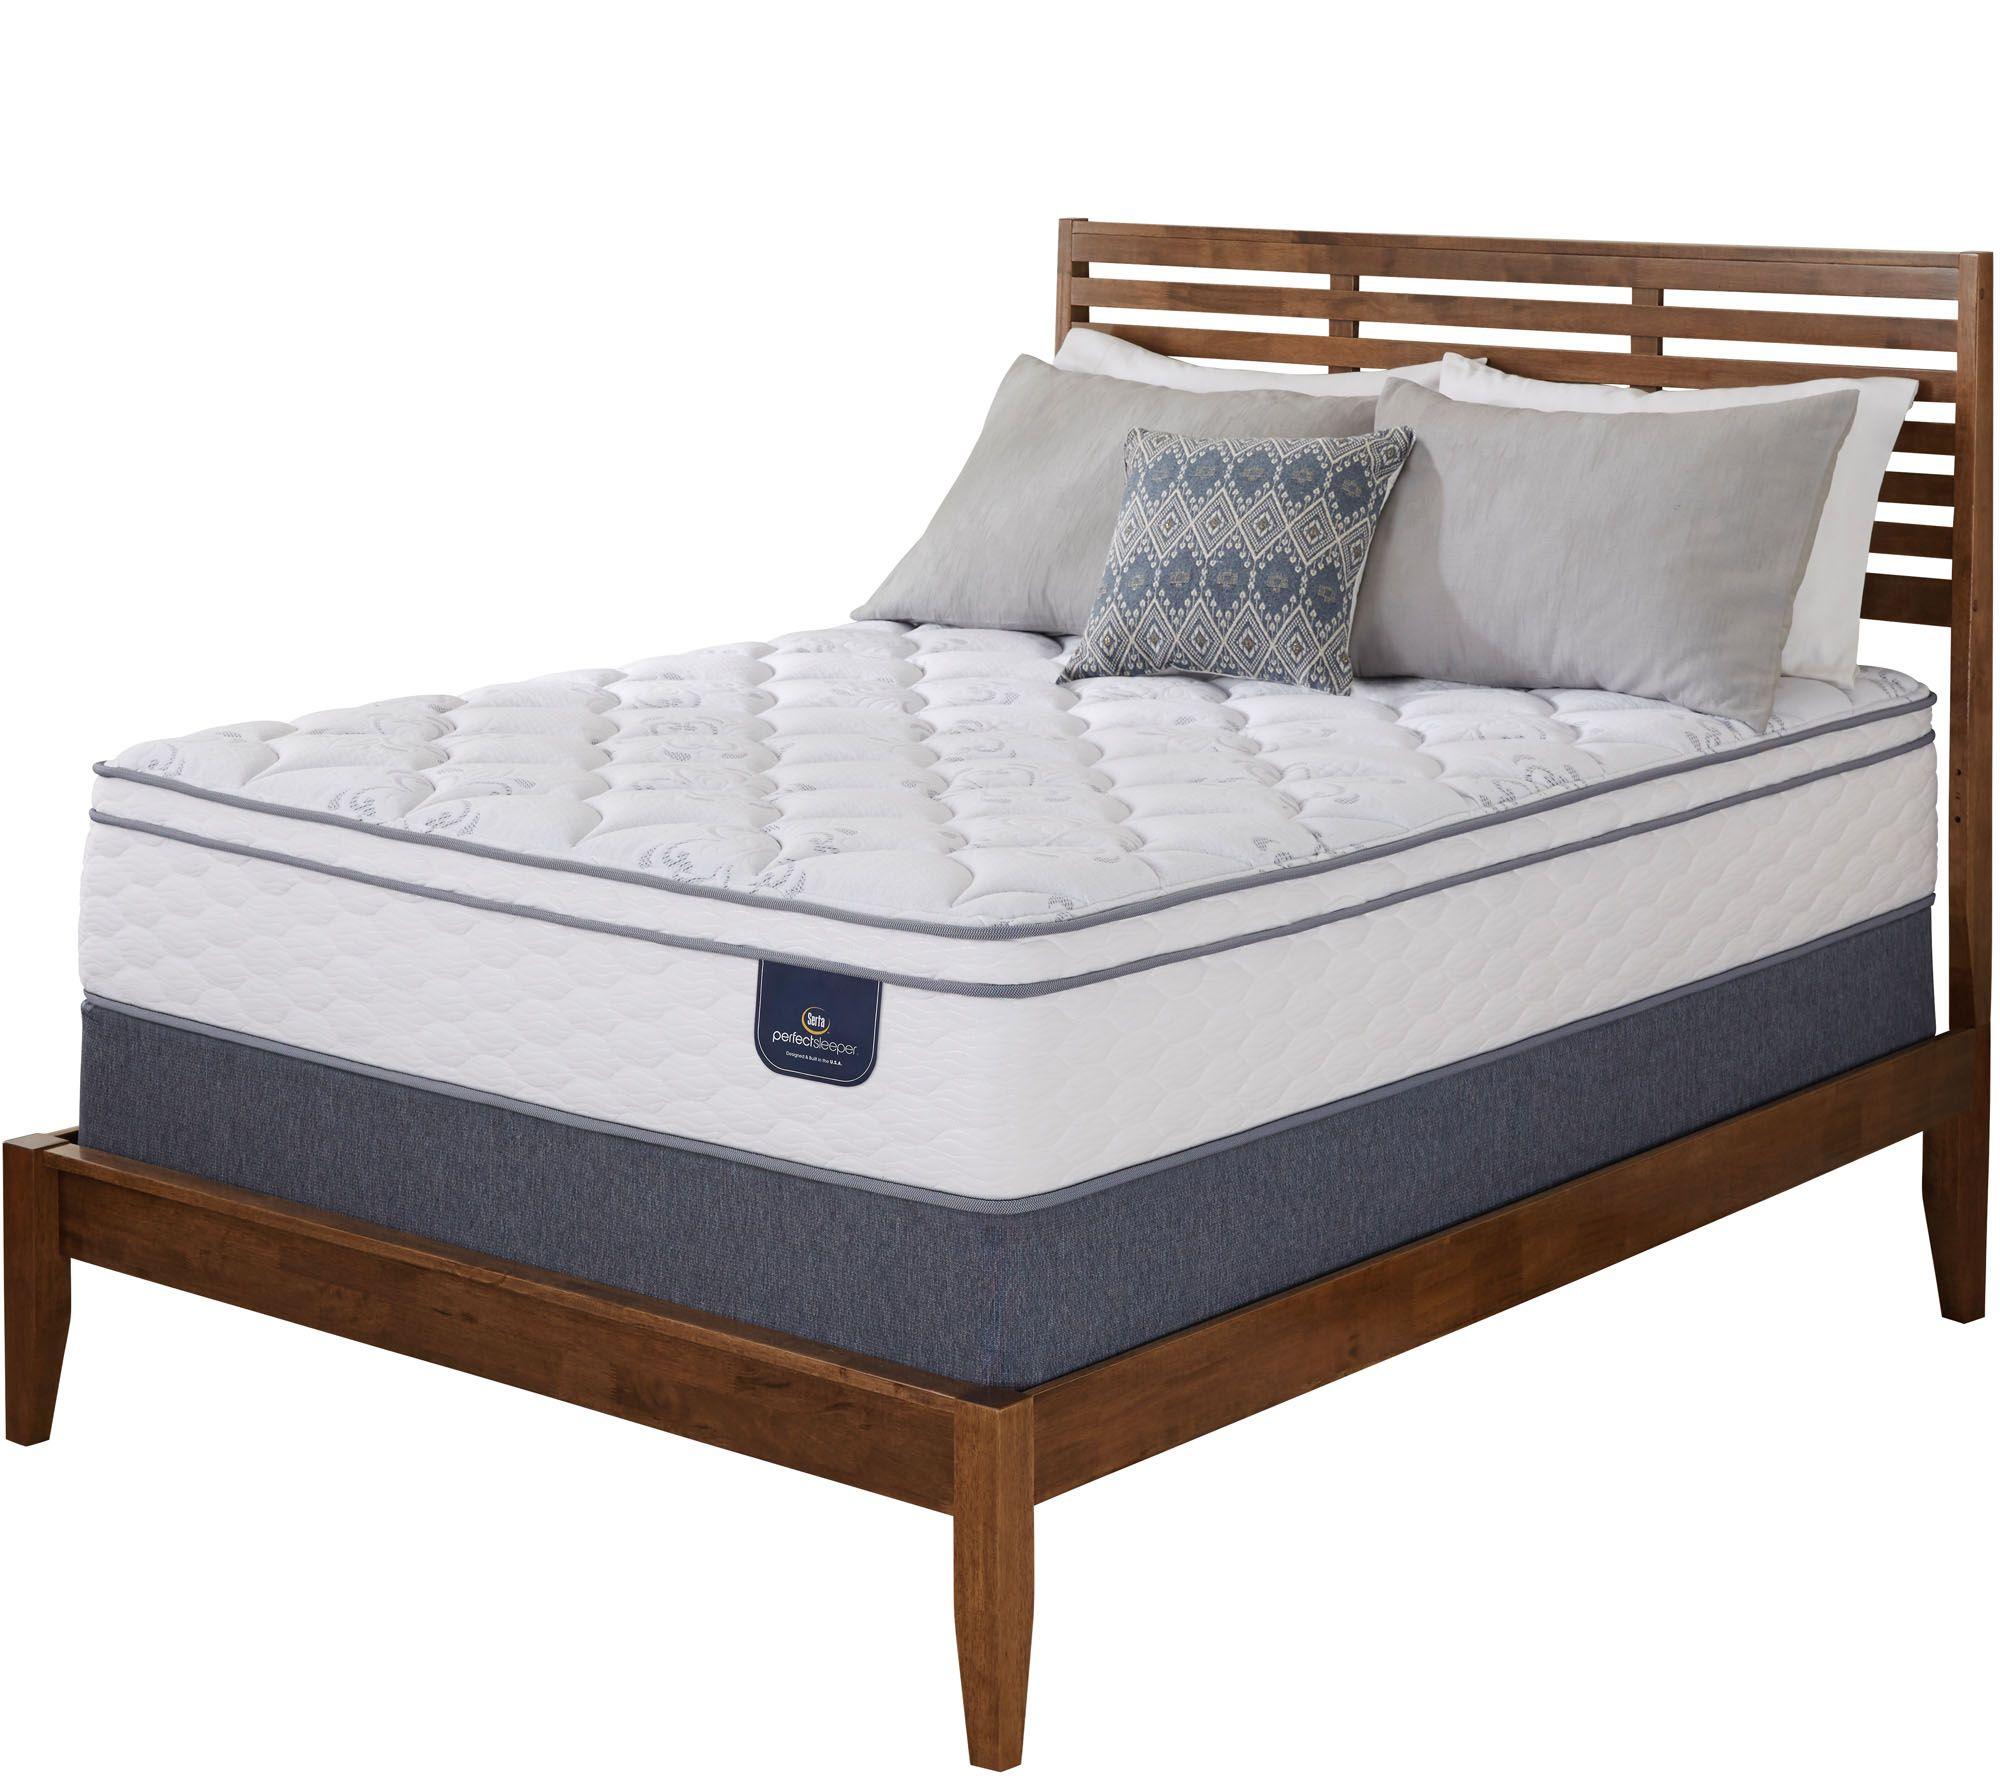 serta perfect sleeper freeport eurotop full mattress set page 1